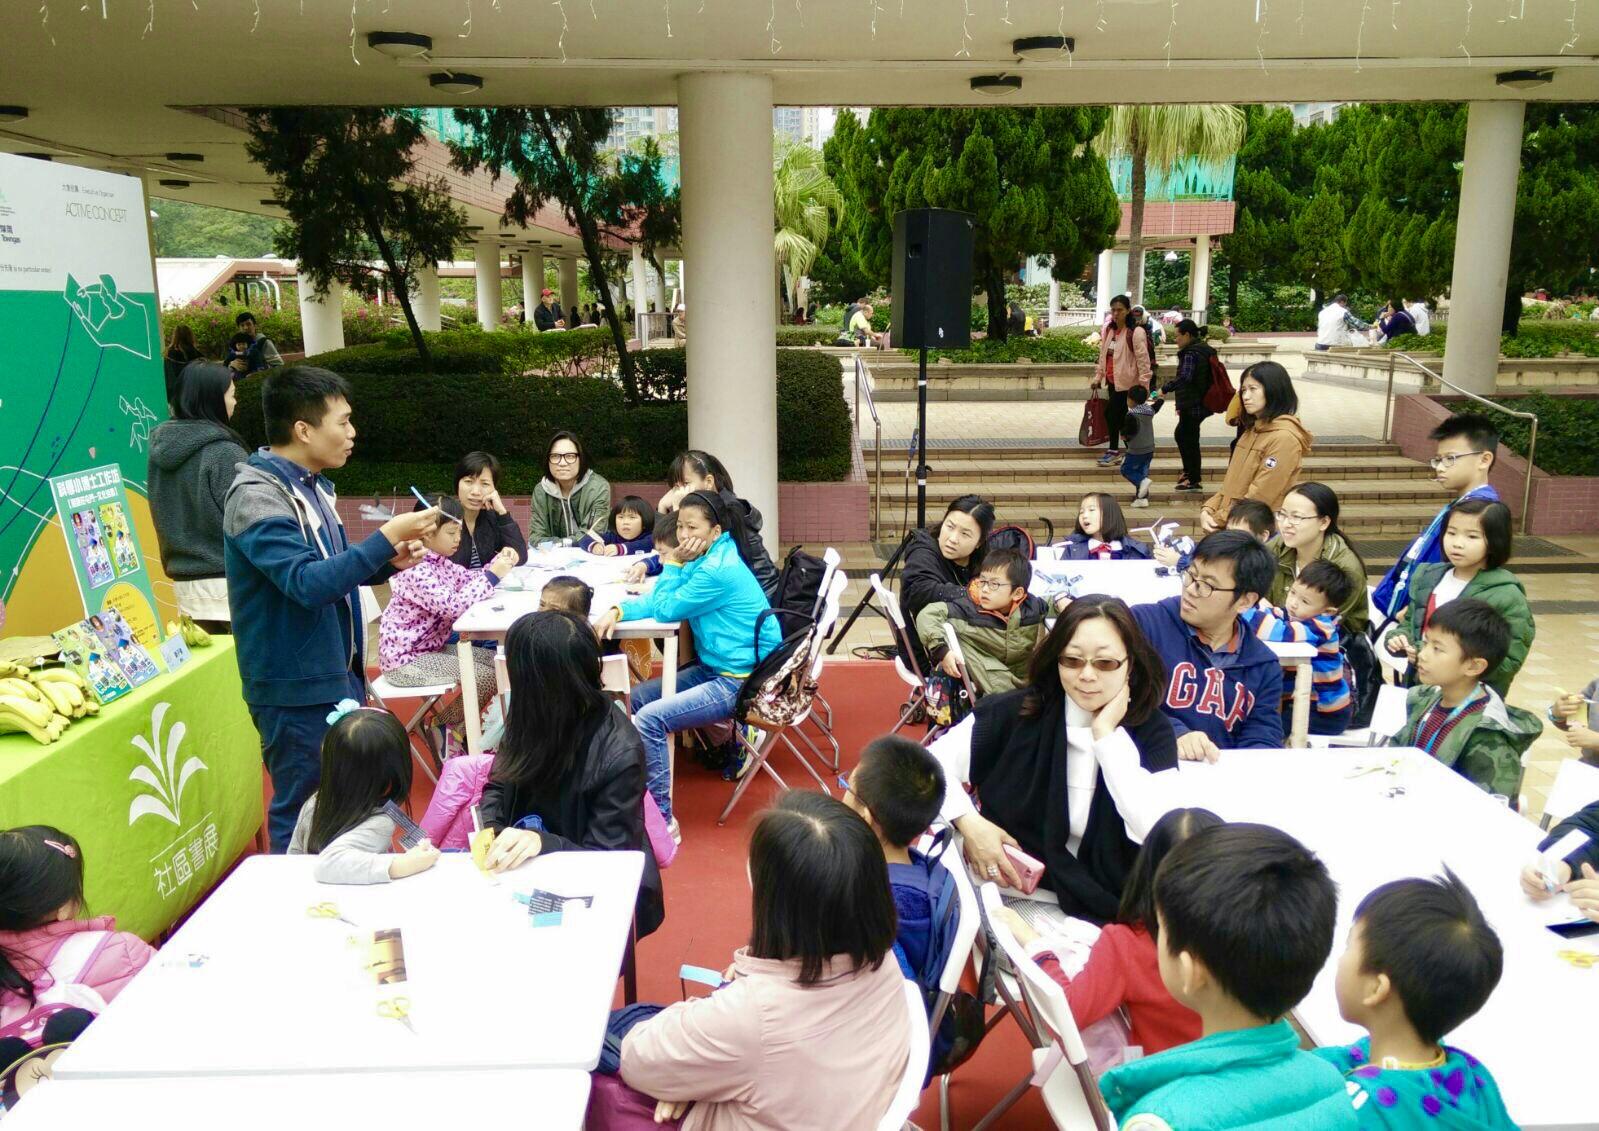 2017 Community Bookfair 社區書展